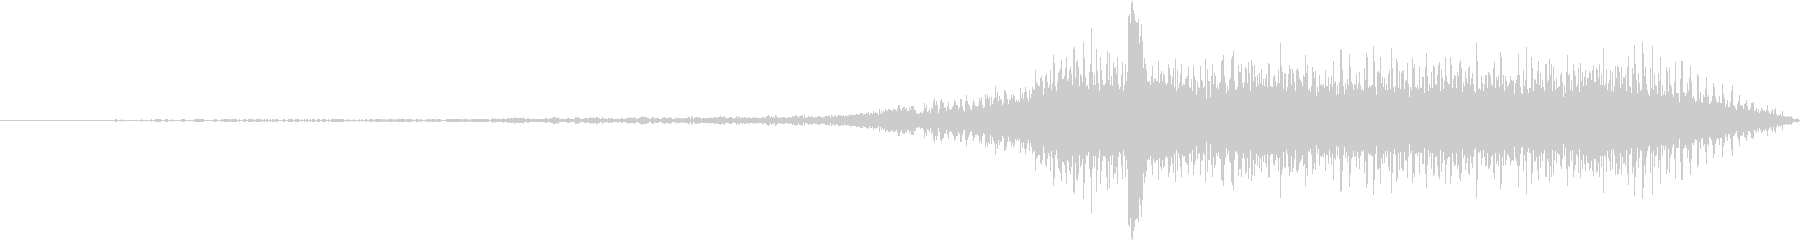 500 Ccスノーモービル:電動ス...の未再生の波形